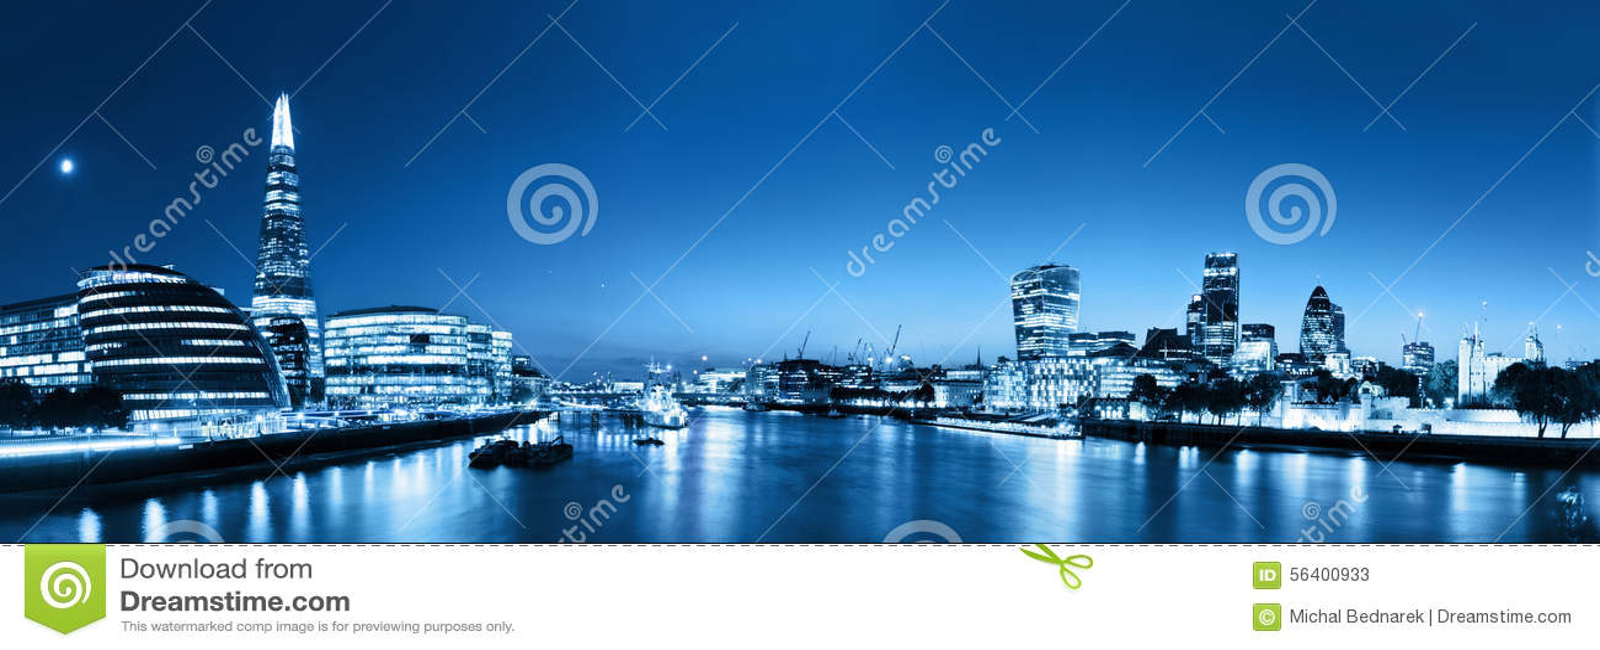 London skyline panorama at night, England the UK. River Thames,